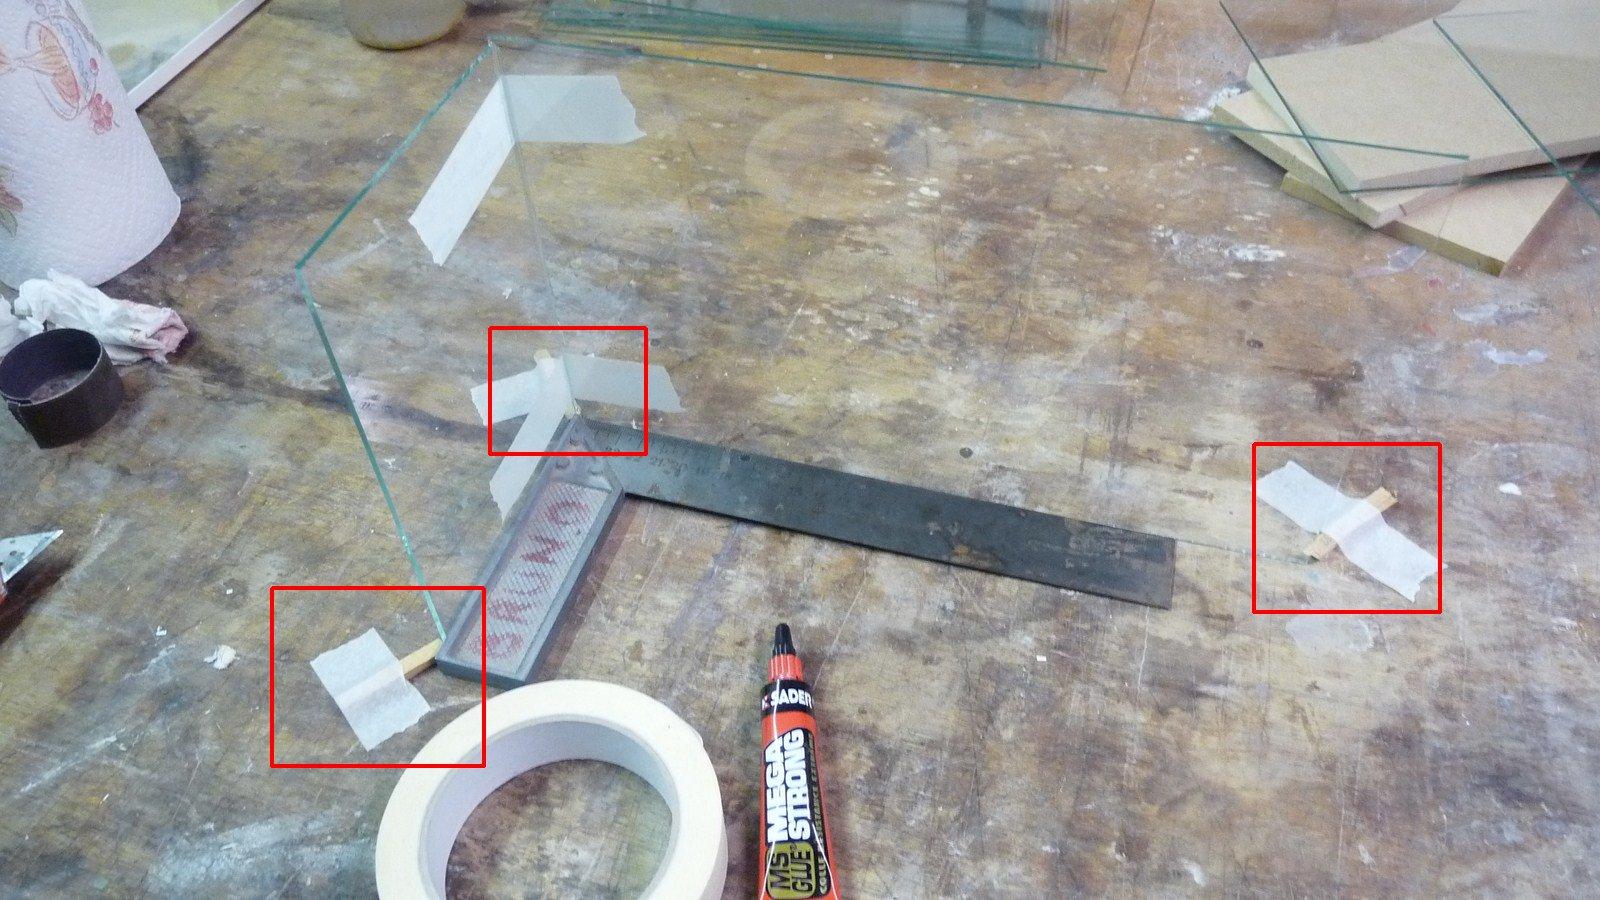 Fabriquer ses propres vitrines en verre 17071907263223134915156545